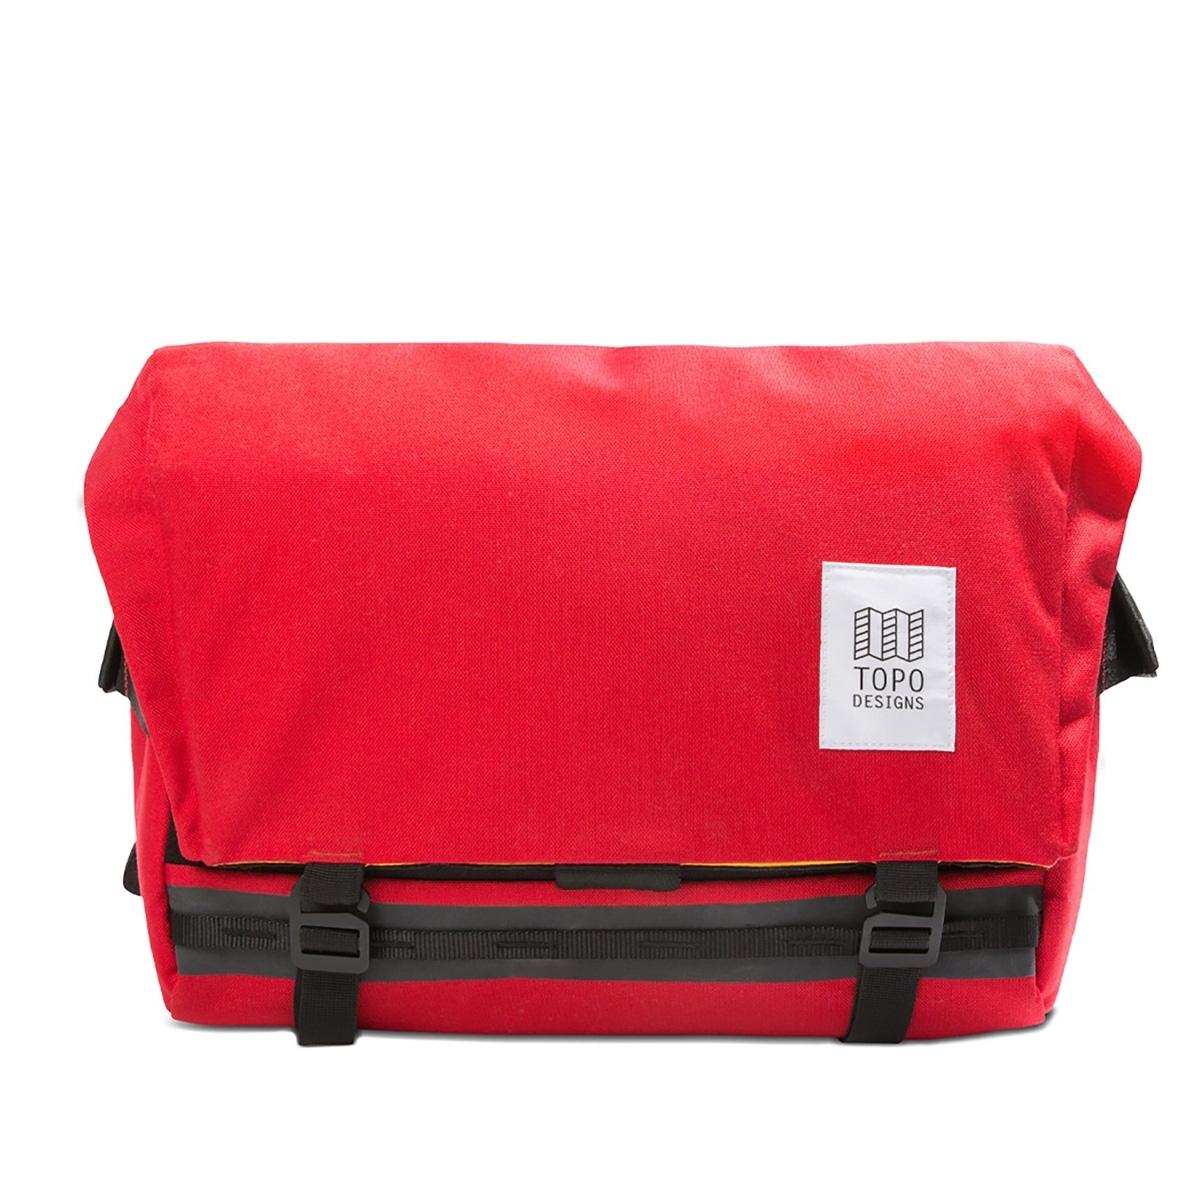 Topo Designs Messenger Bag Red